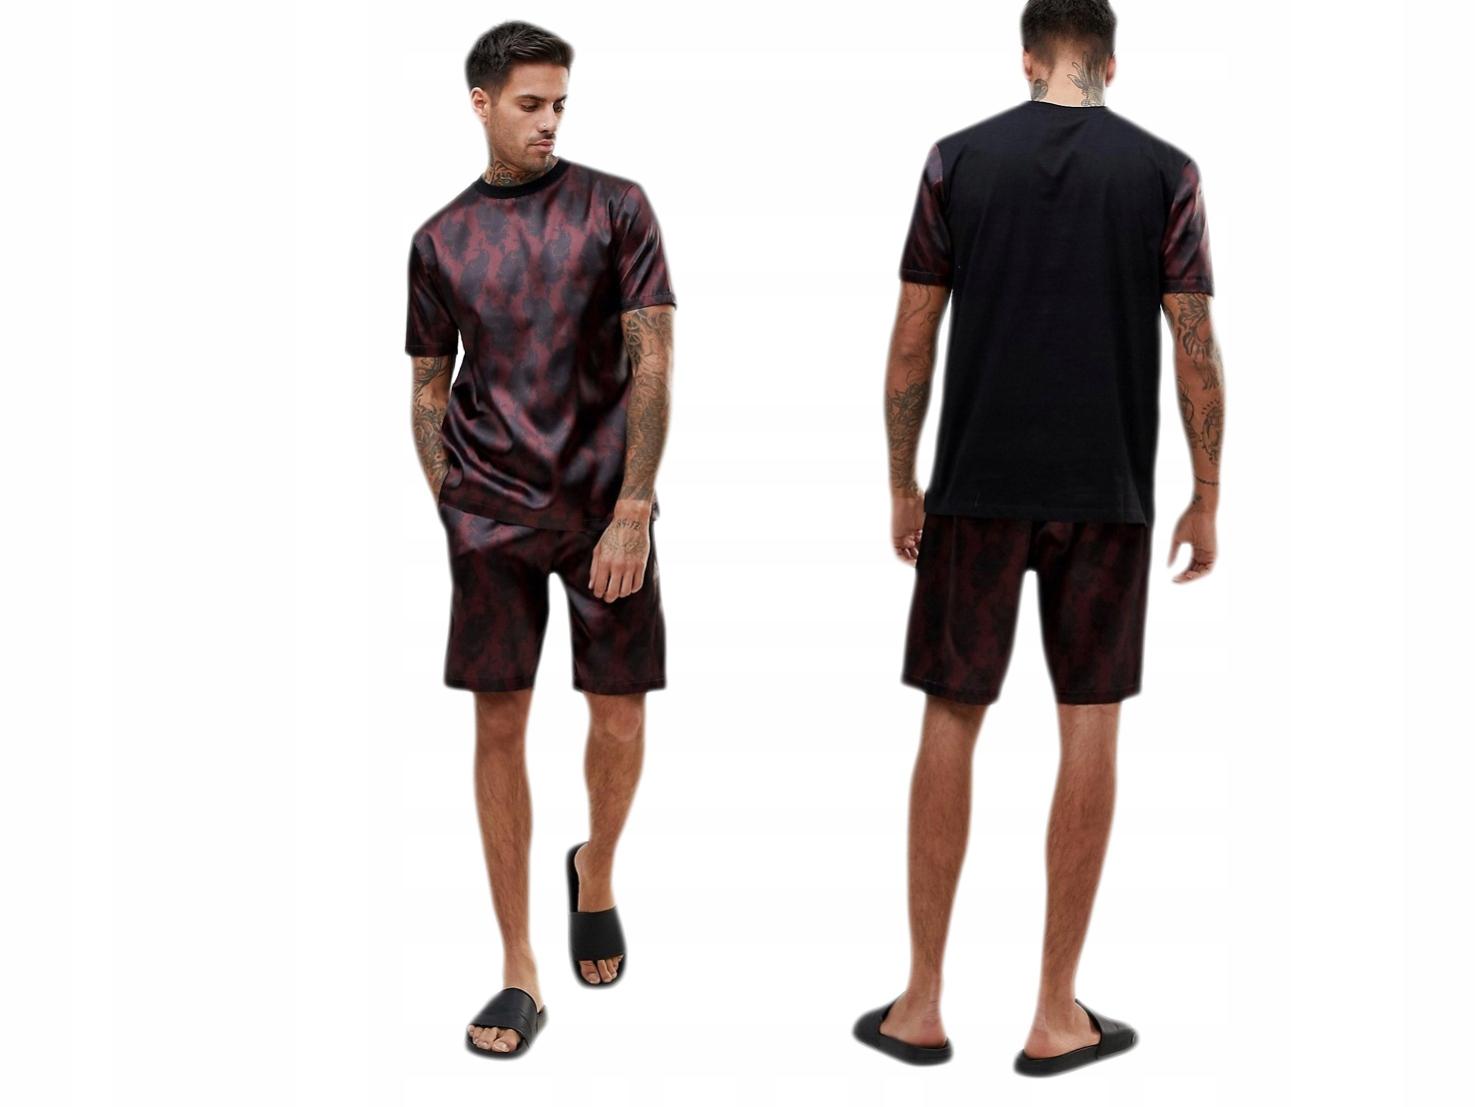 Piżama męska komplet koszulka/spodenki L